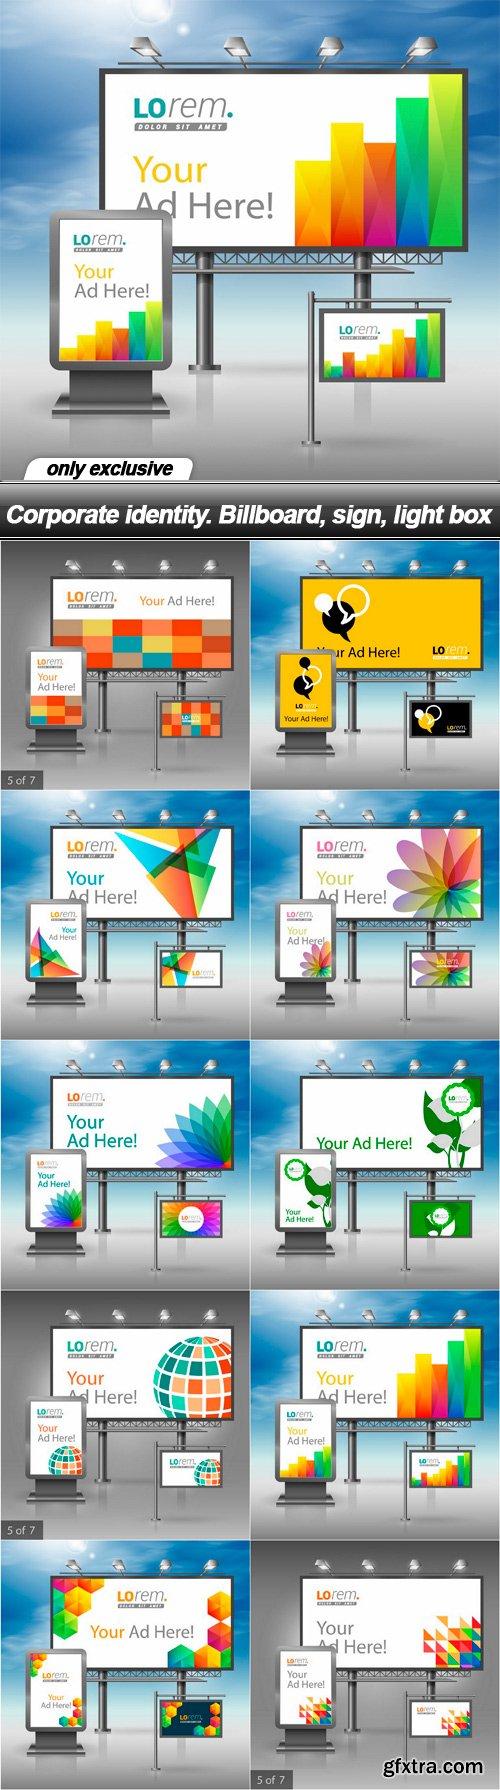 Corporate identity. Billboard, sign, light box - 10 EPS